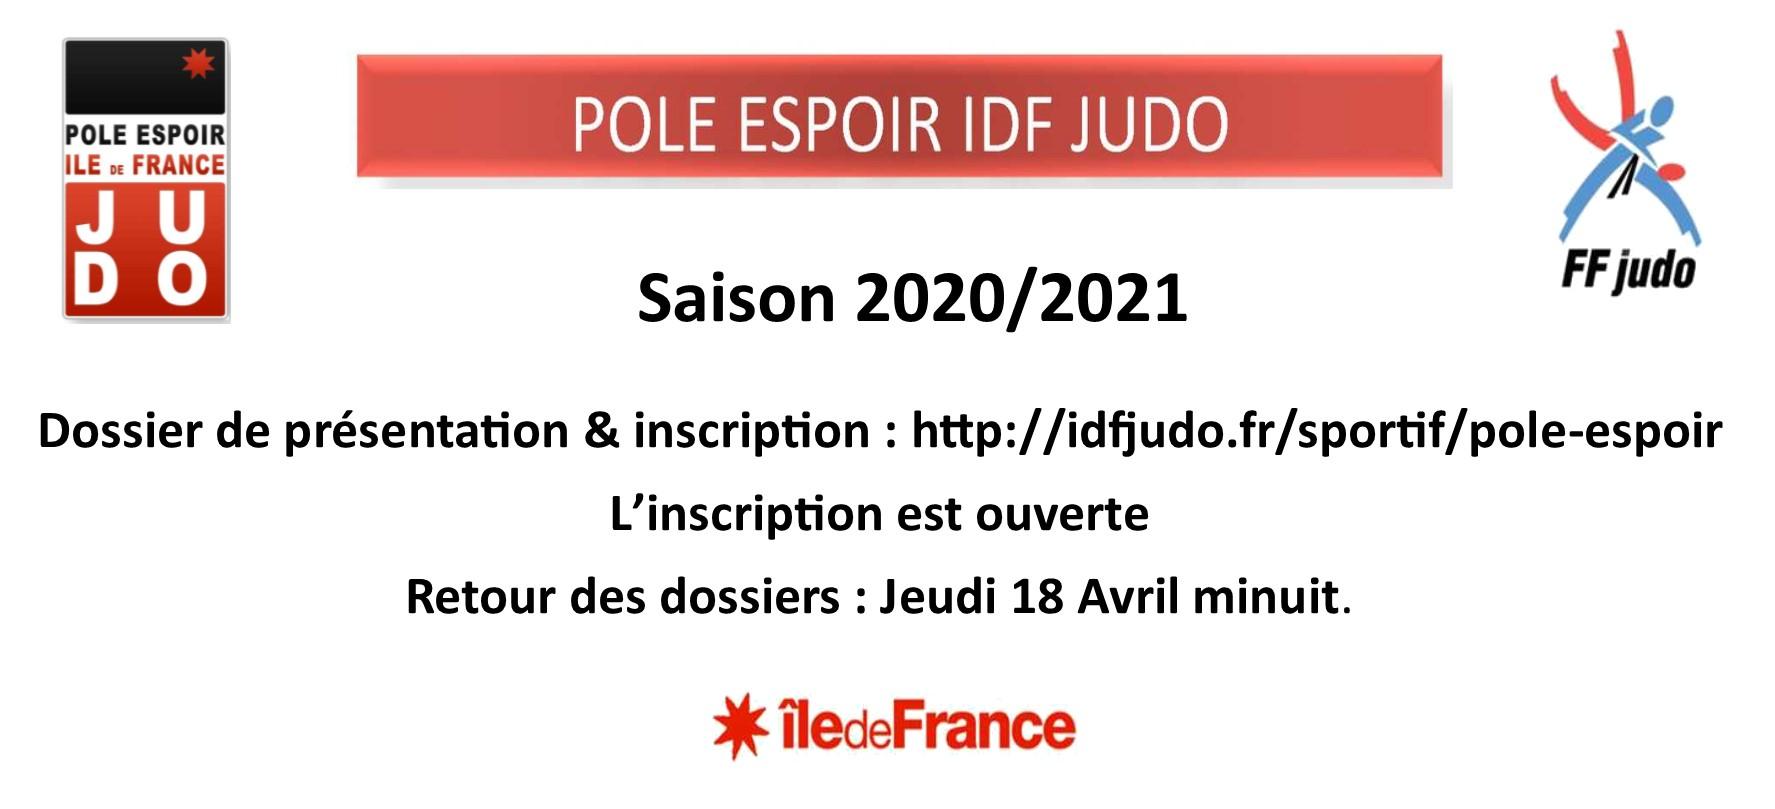 Pôle Espoir IDF B 2020-2021